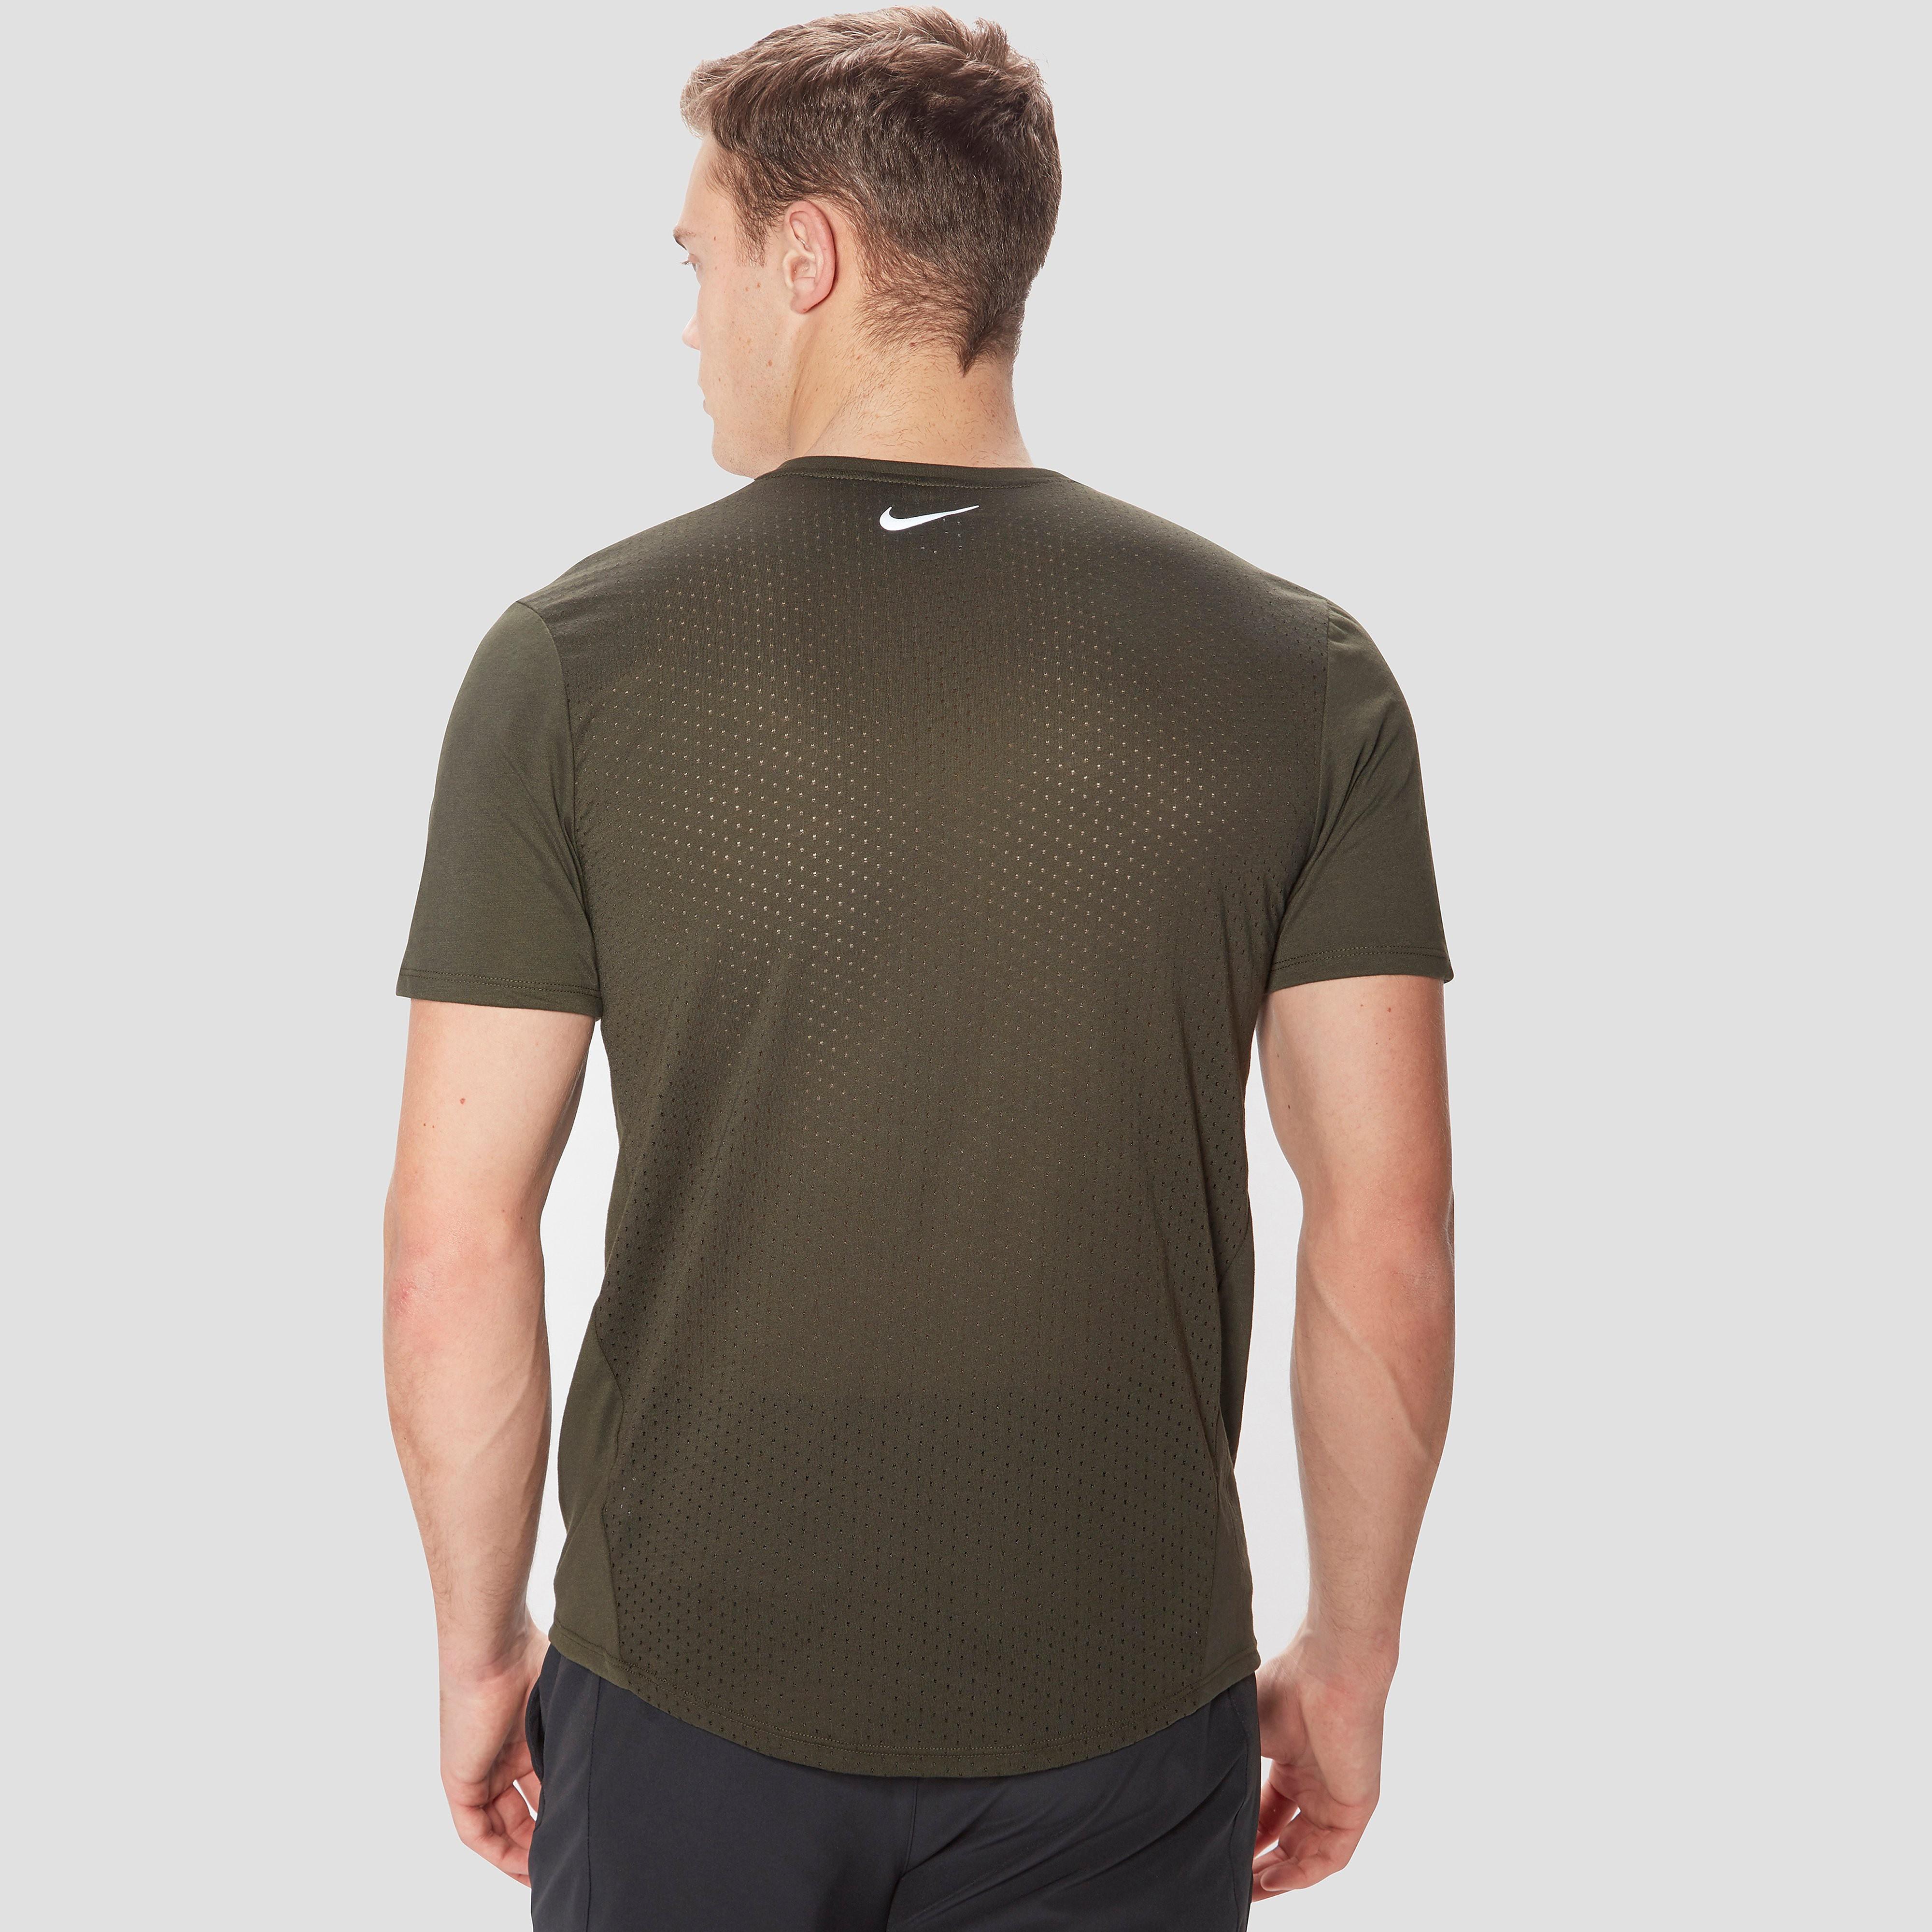 Nike Tailwind Short Sleeve Men's Running Top